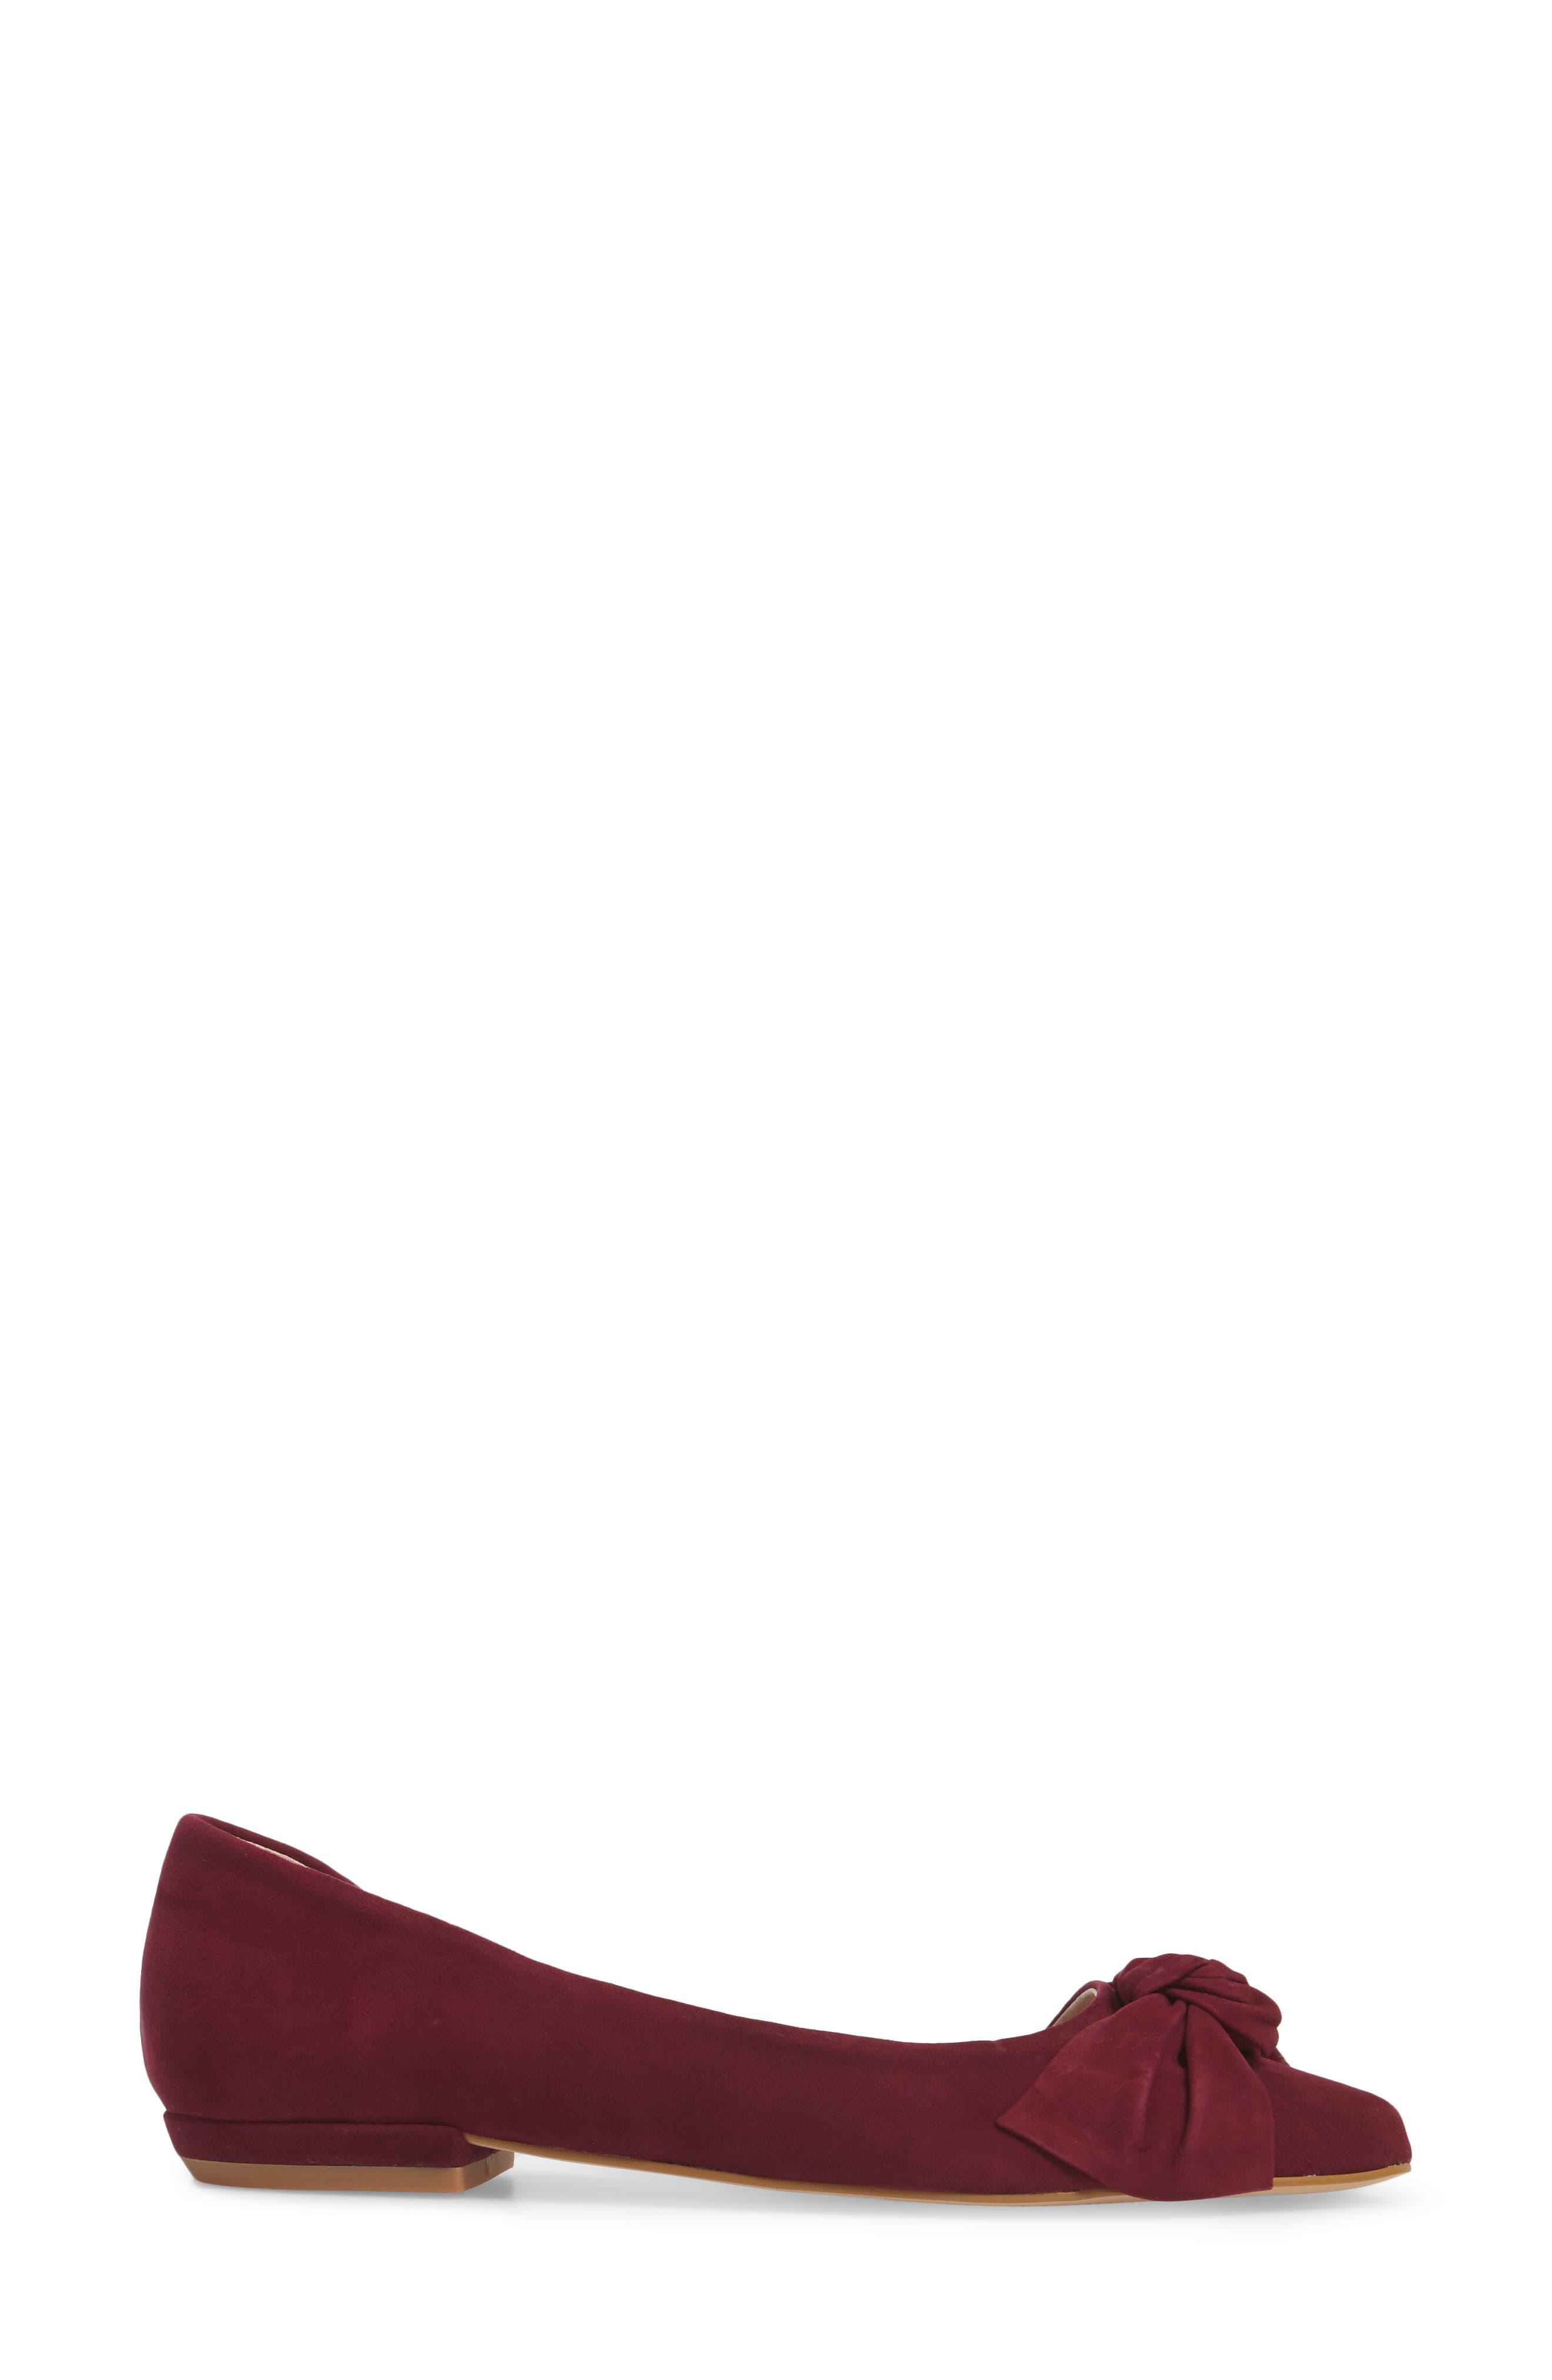 Edina d'Orsay Bow Flat,                             Alternate thumbnail 3, color,                             Burgundy Suede